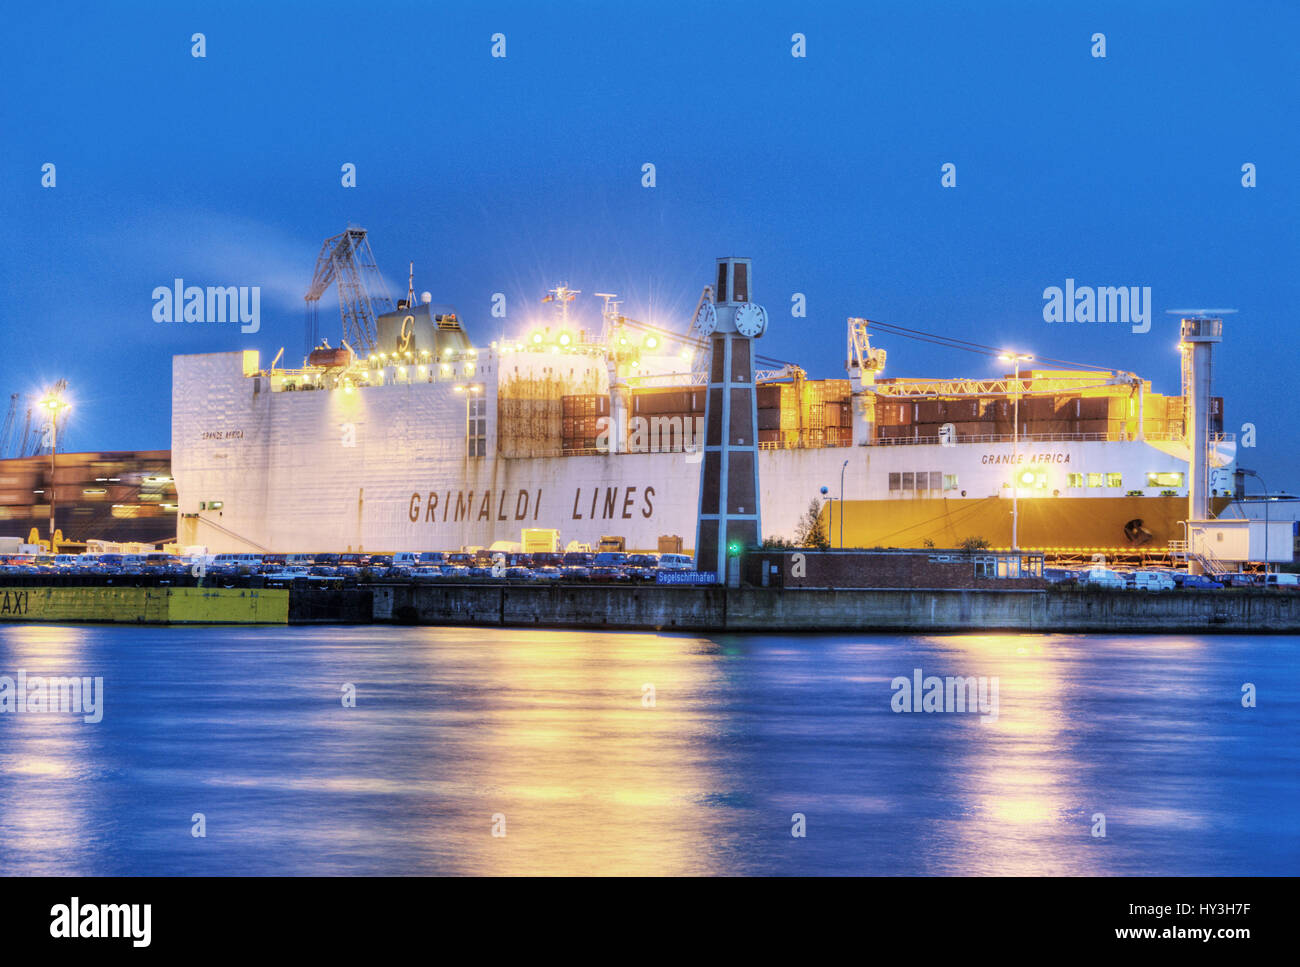 ConRo ship grandee Africa of the Grimaldi Lines in the QUAY O?'SWALD in Hamburg, Germany, Europe, ConRo-Schiff - Stock Image